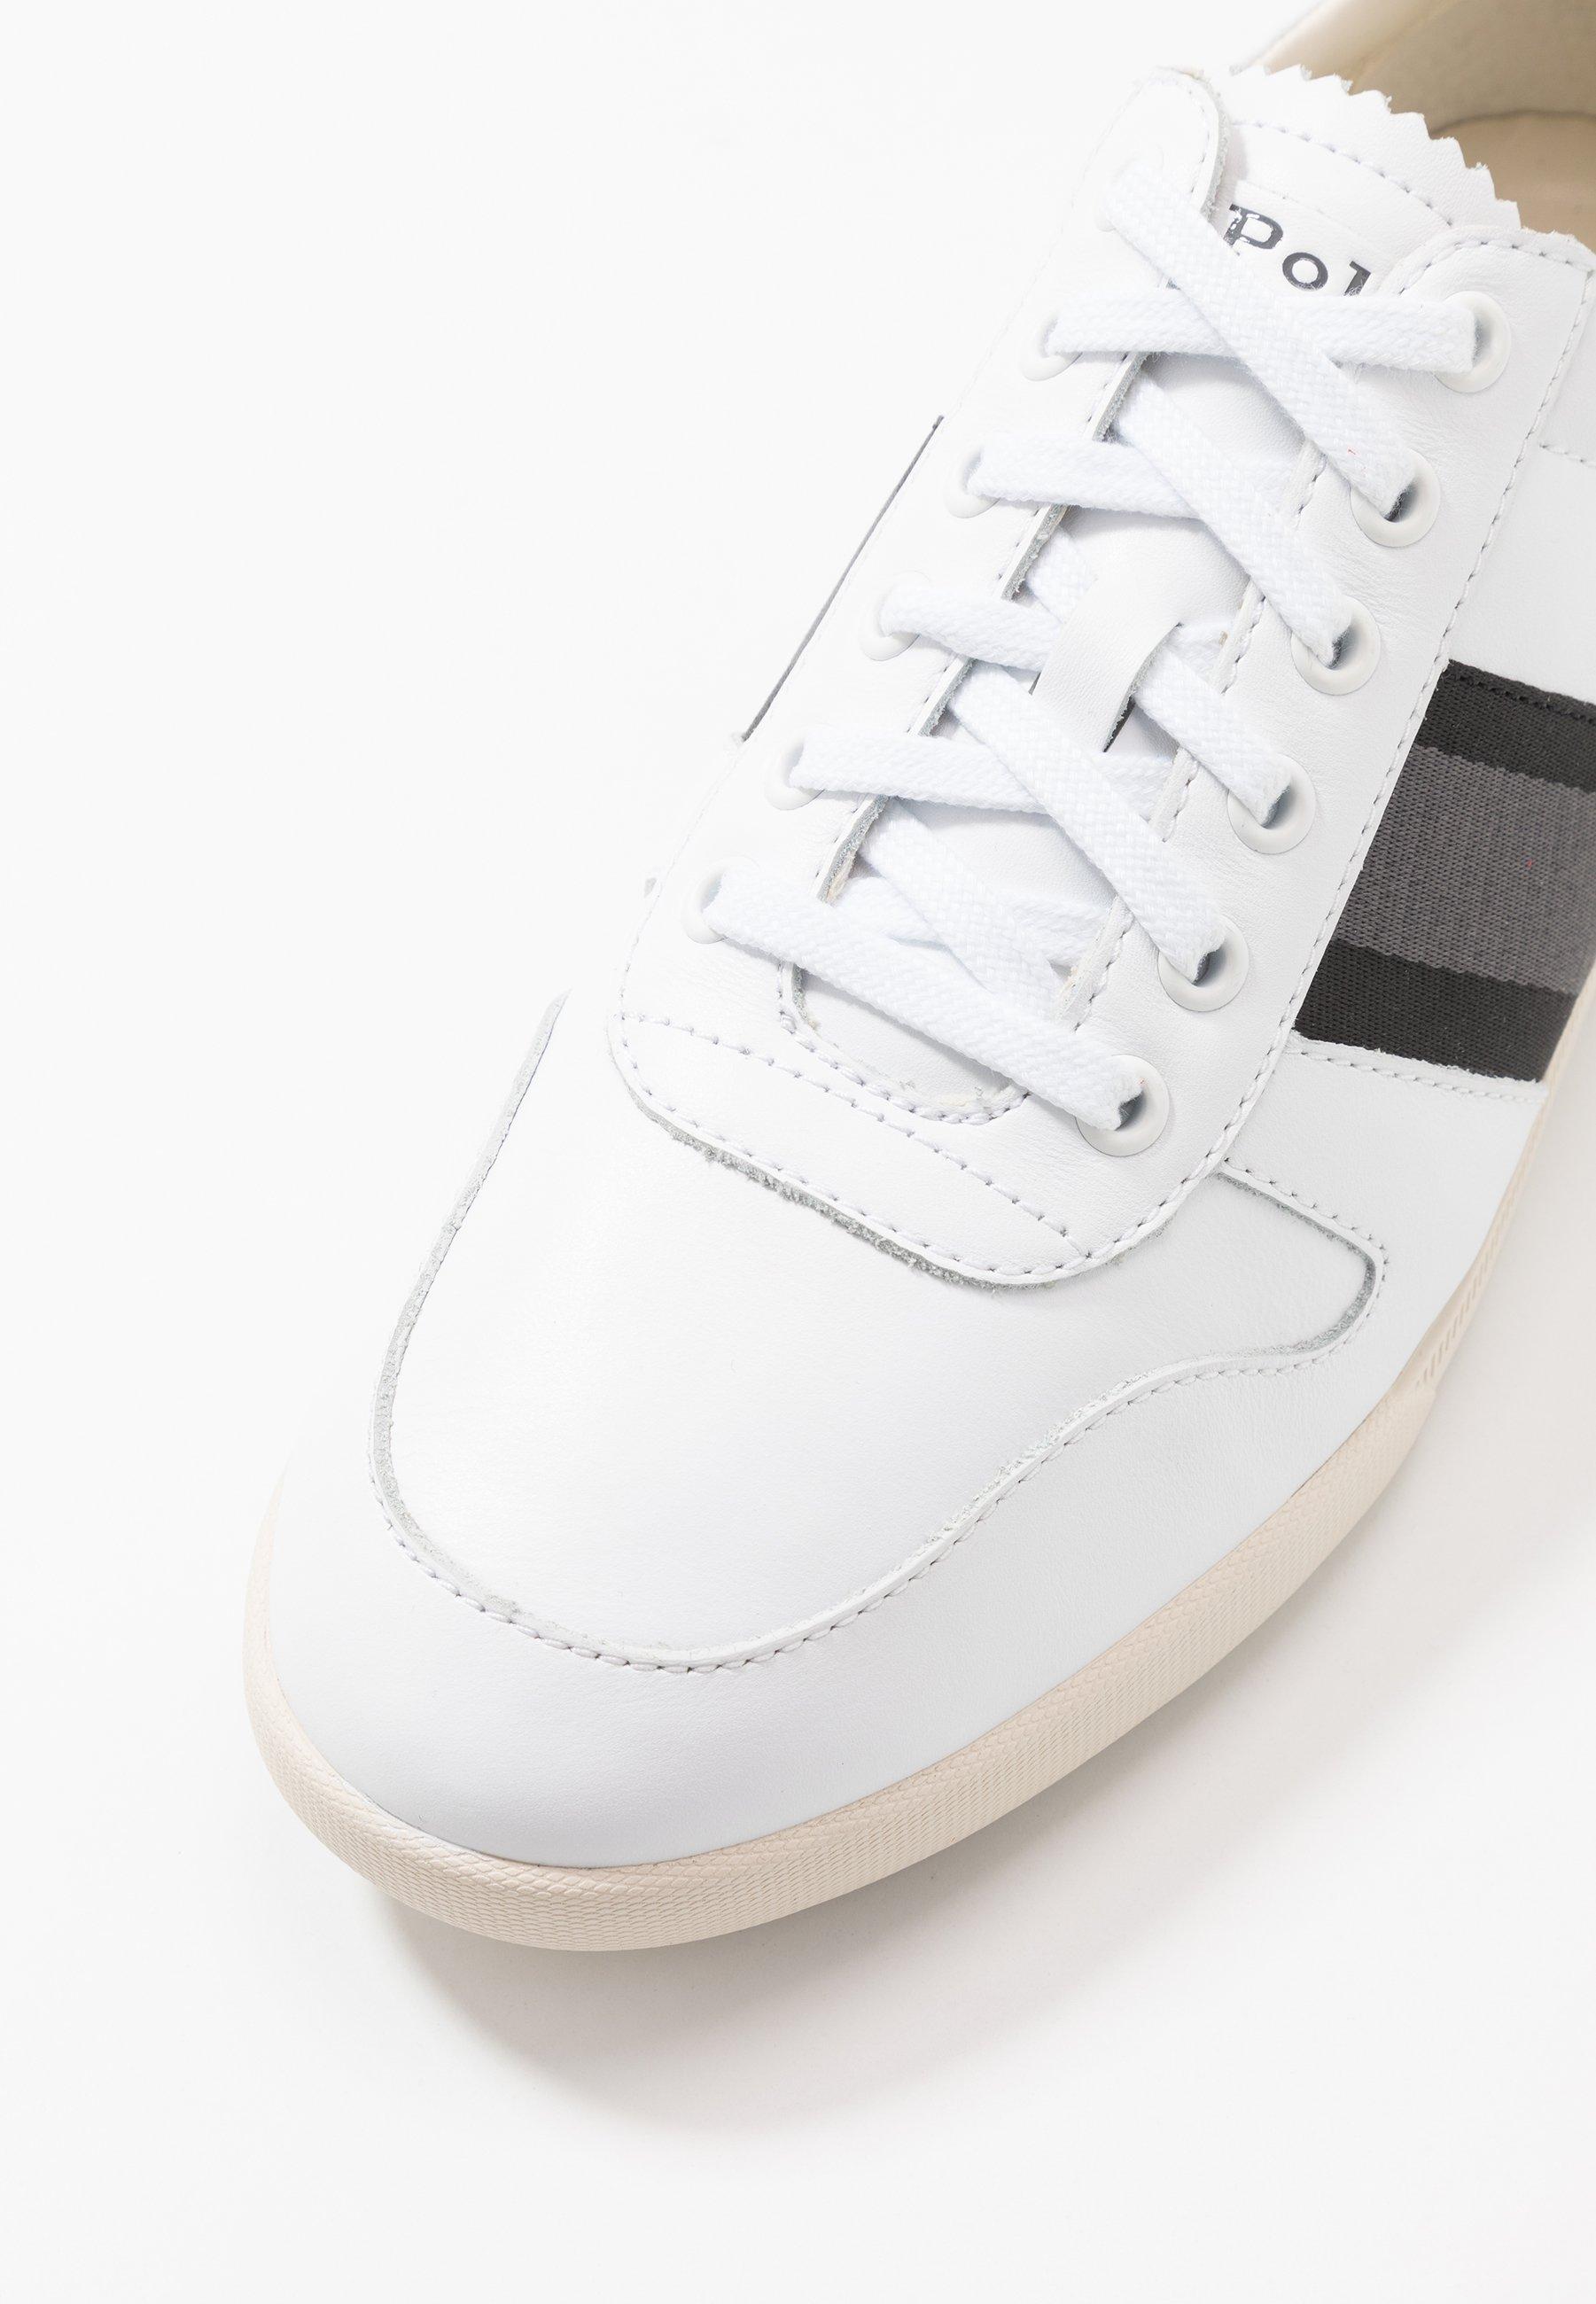 Polo Ralph Lauren CAMILO - Sneakers - white/black/grey